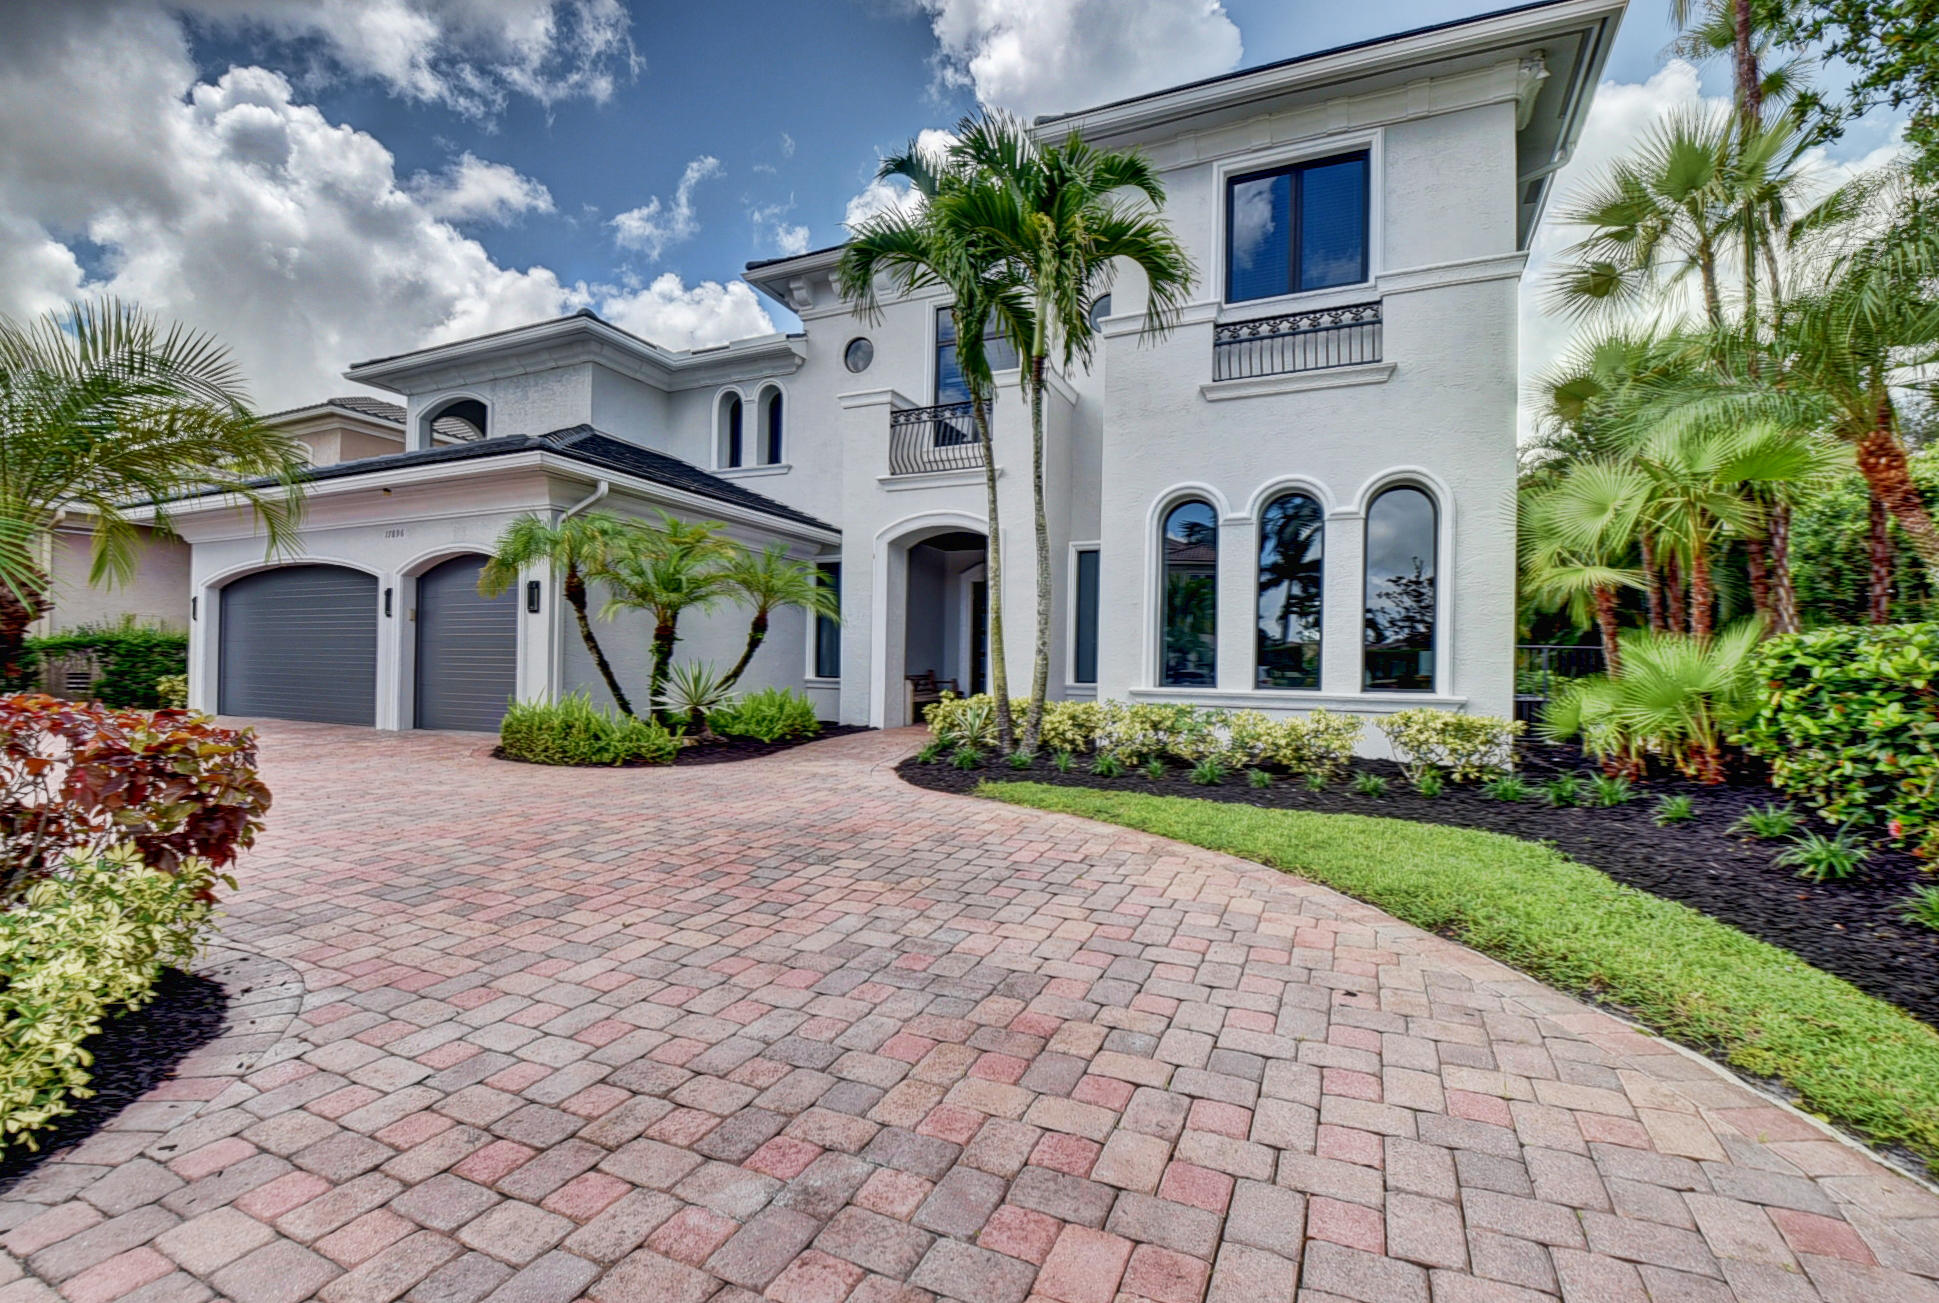 Photo of 17896 Key Vista Way, Boca Raton, FL 33496